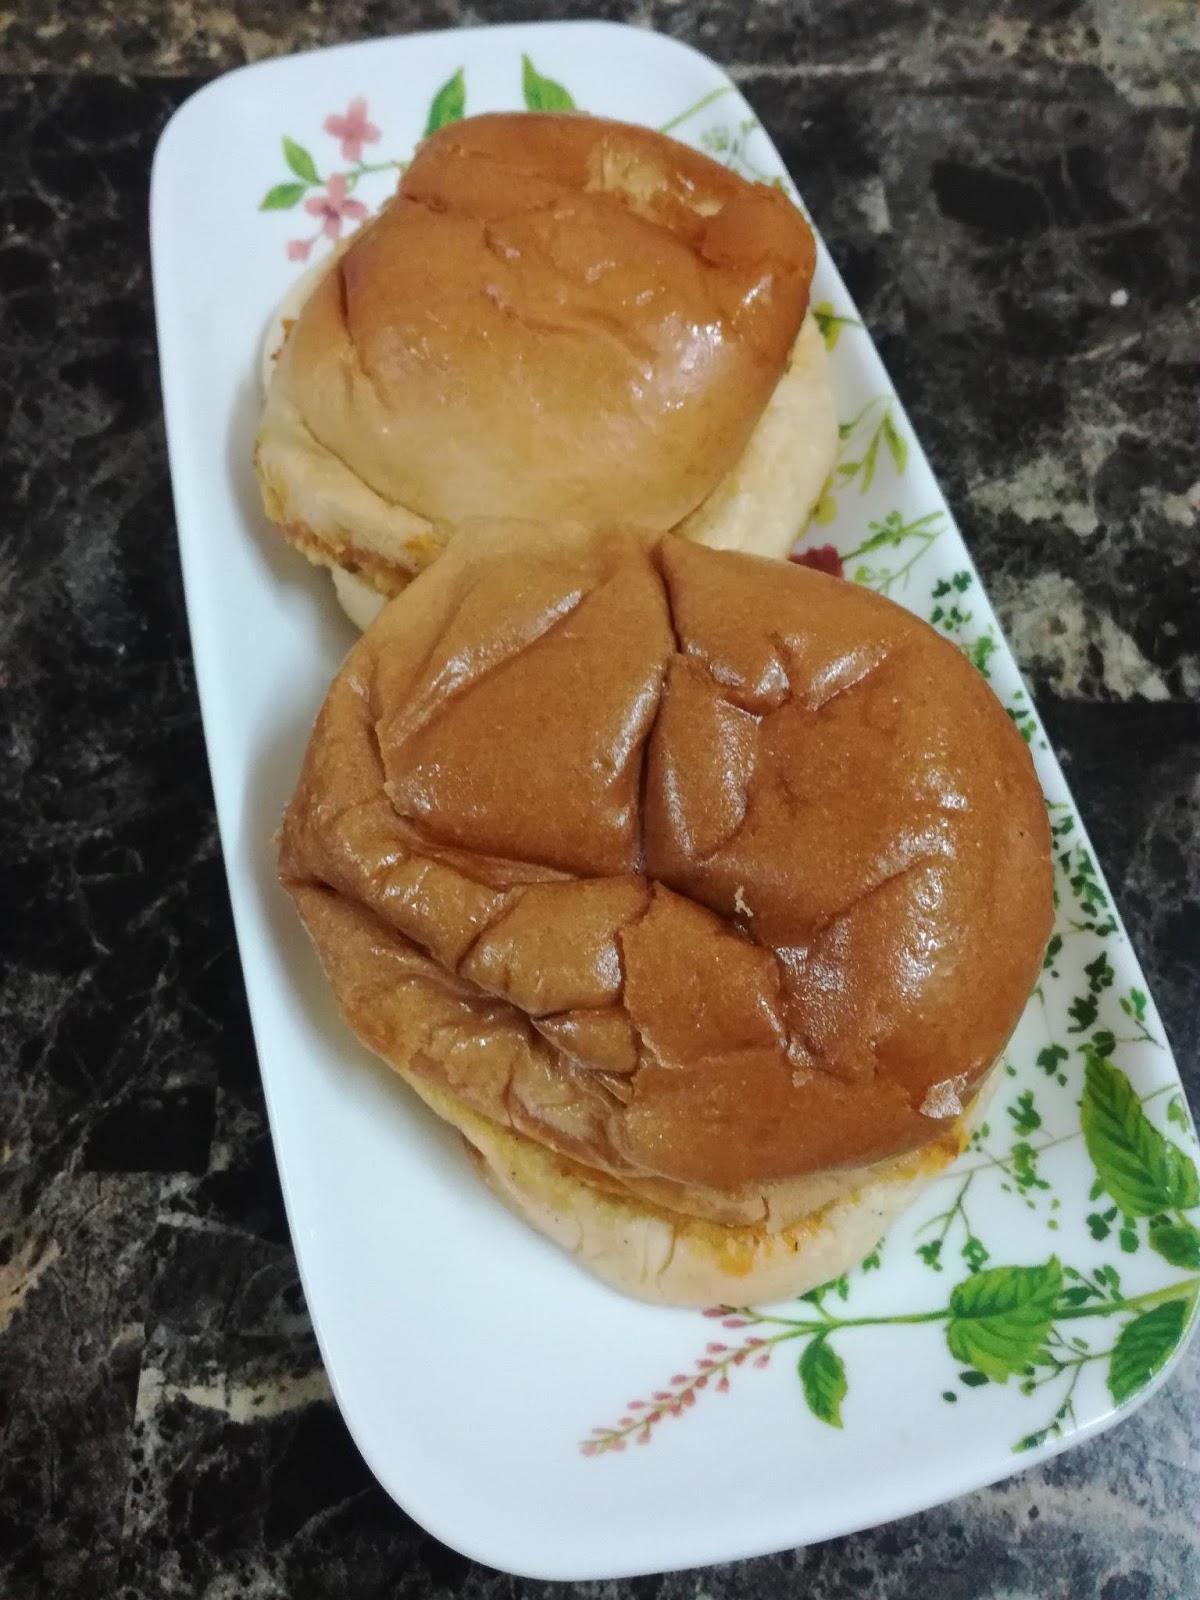 Setelah Bahan Agak Masak Letn Roti John Tadi Di Atas Tersebut 6 Sapukan Mayonis Dan Sos Cili Sedia Untuk Dihidang